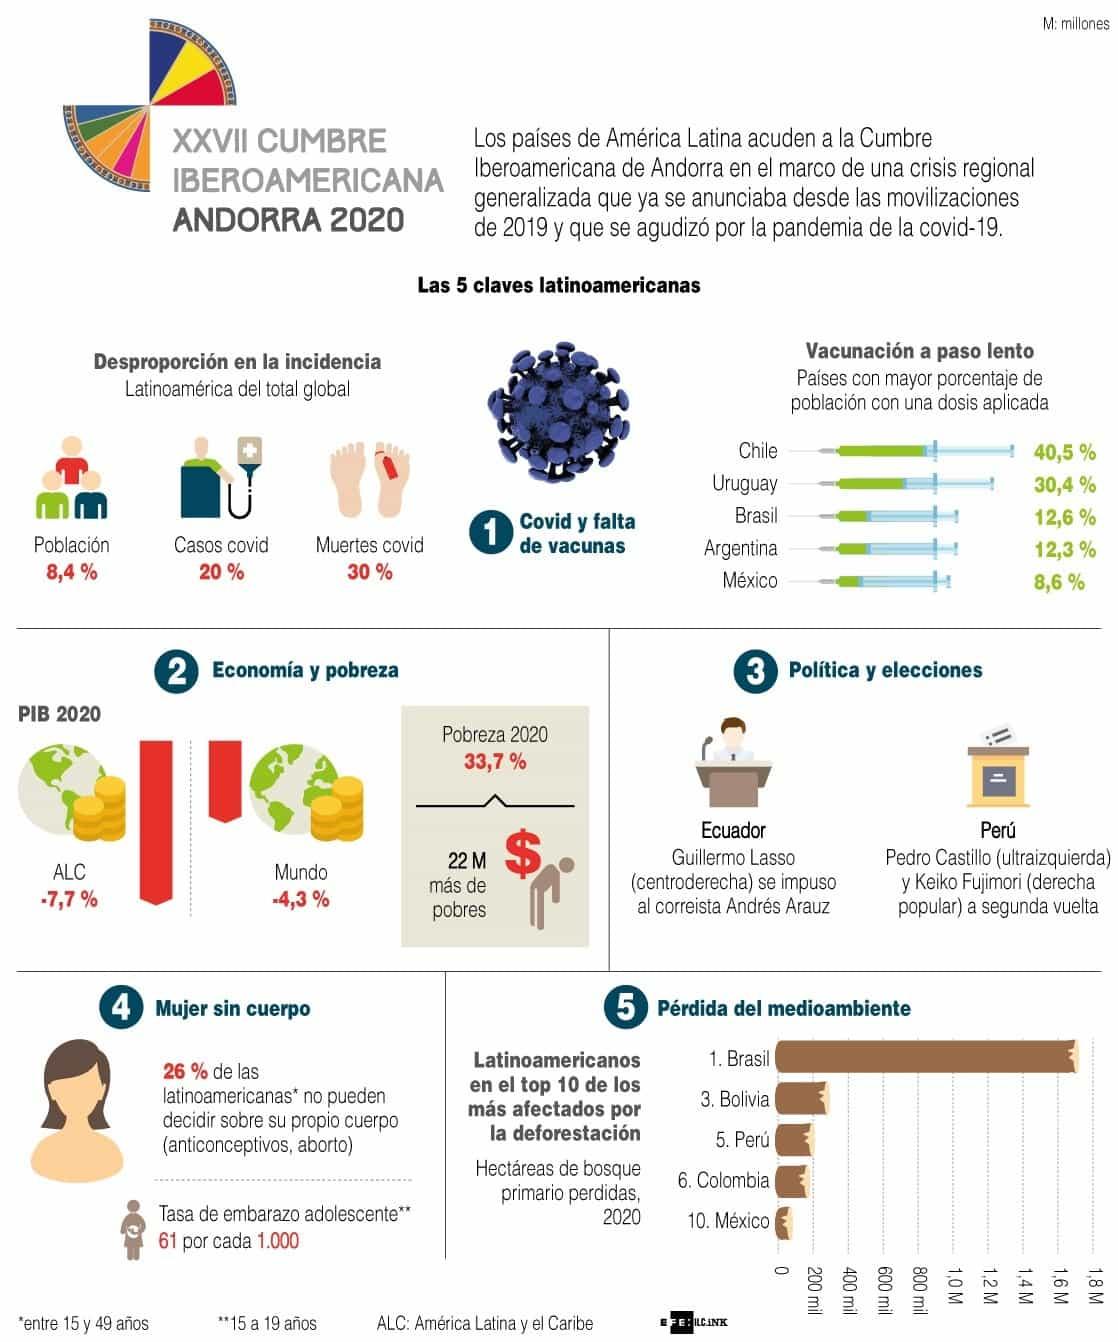 [Infografía] - XXVII Cumbre Iberoamericana de Andorra 1